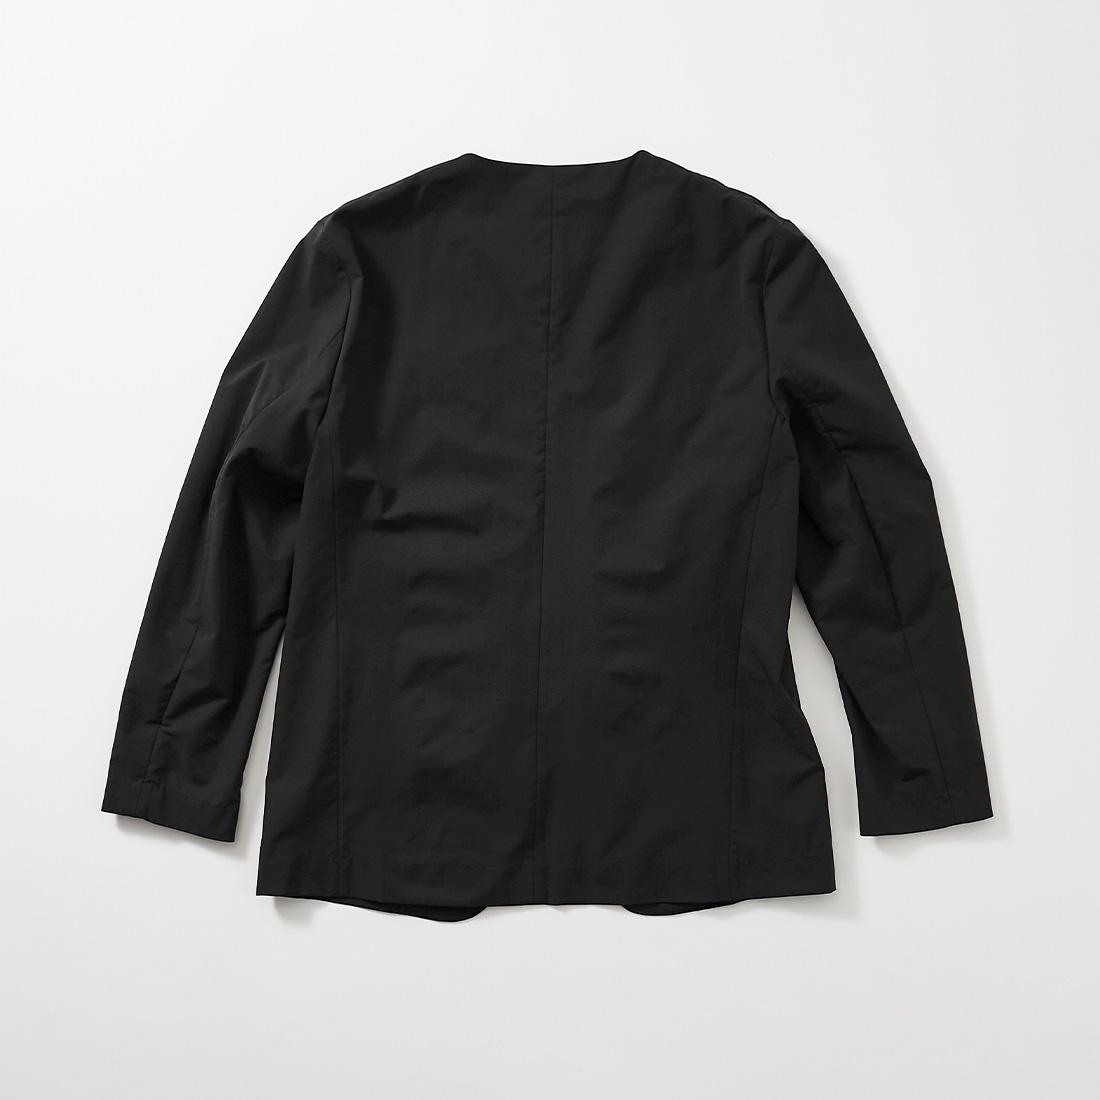 borderless no-collar jacket -male-の商品写真3